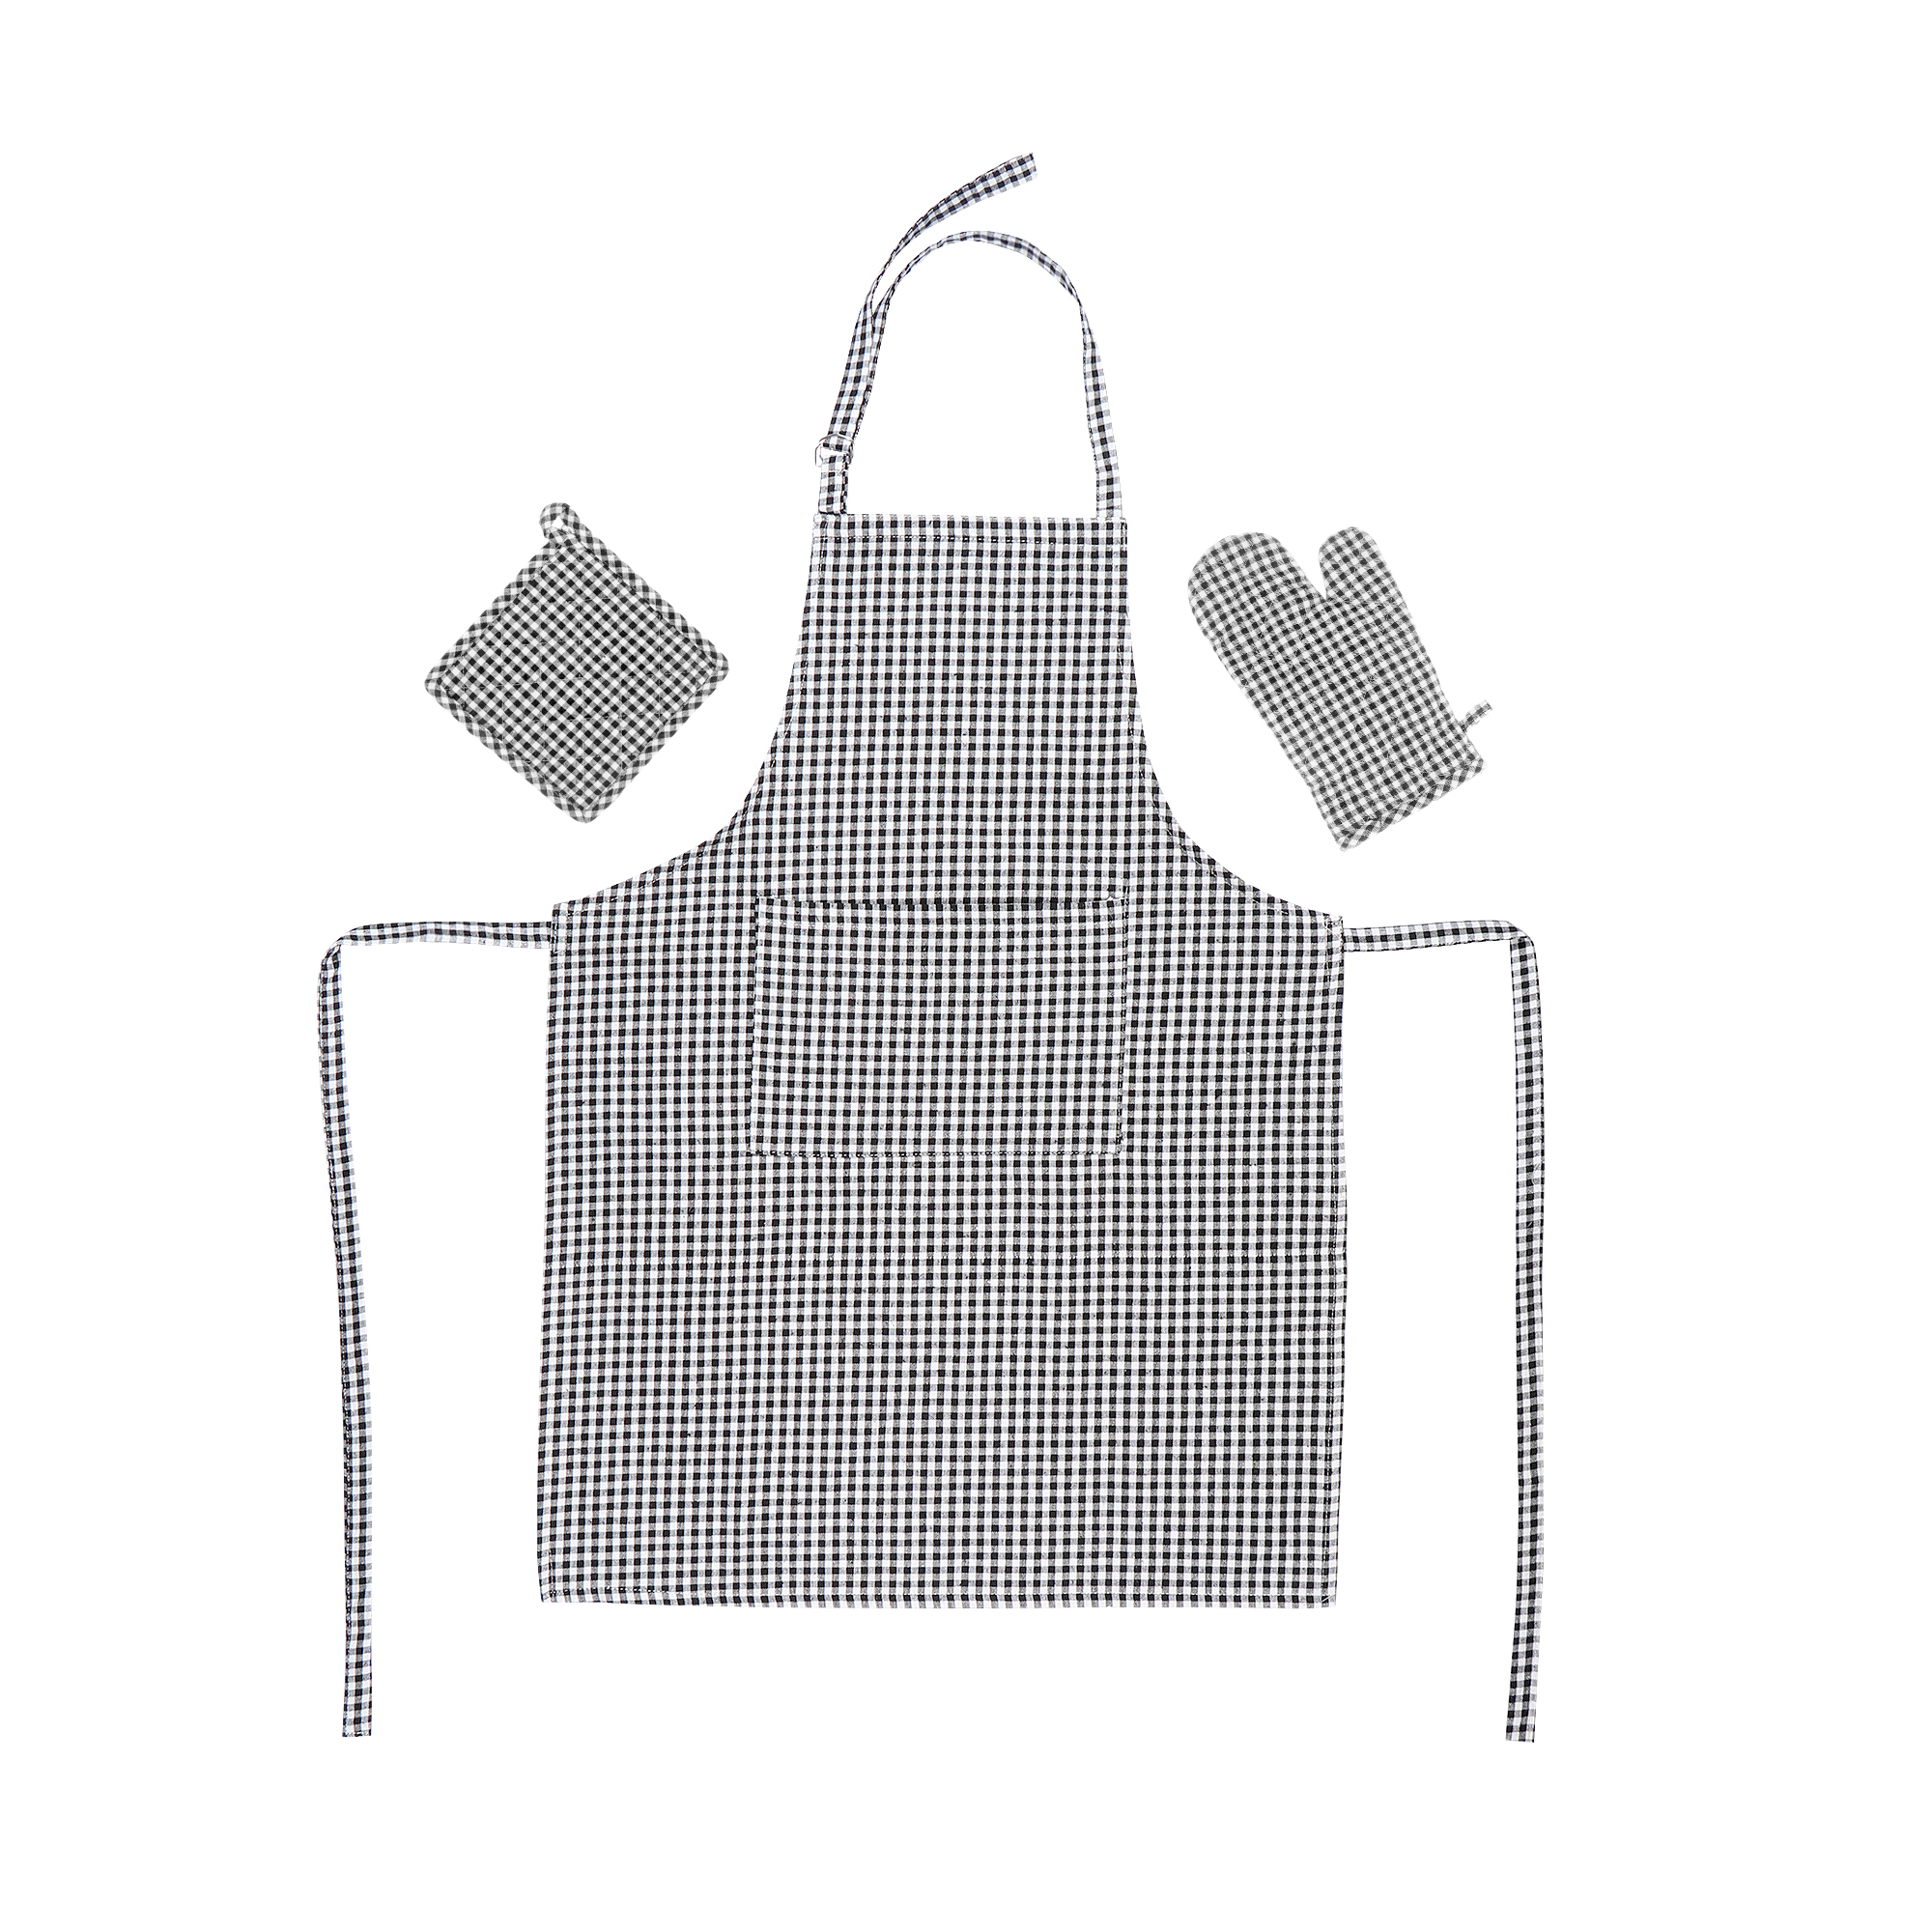 Набор кухонный Homelines textiles фартук/прихватка/рукавица dk grey фото